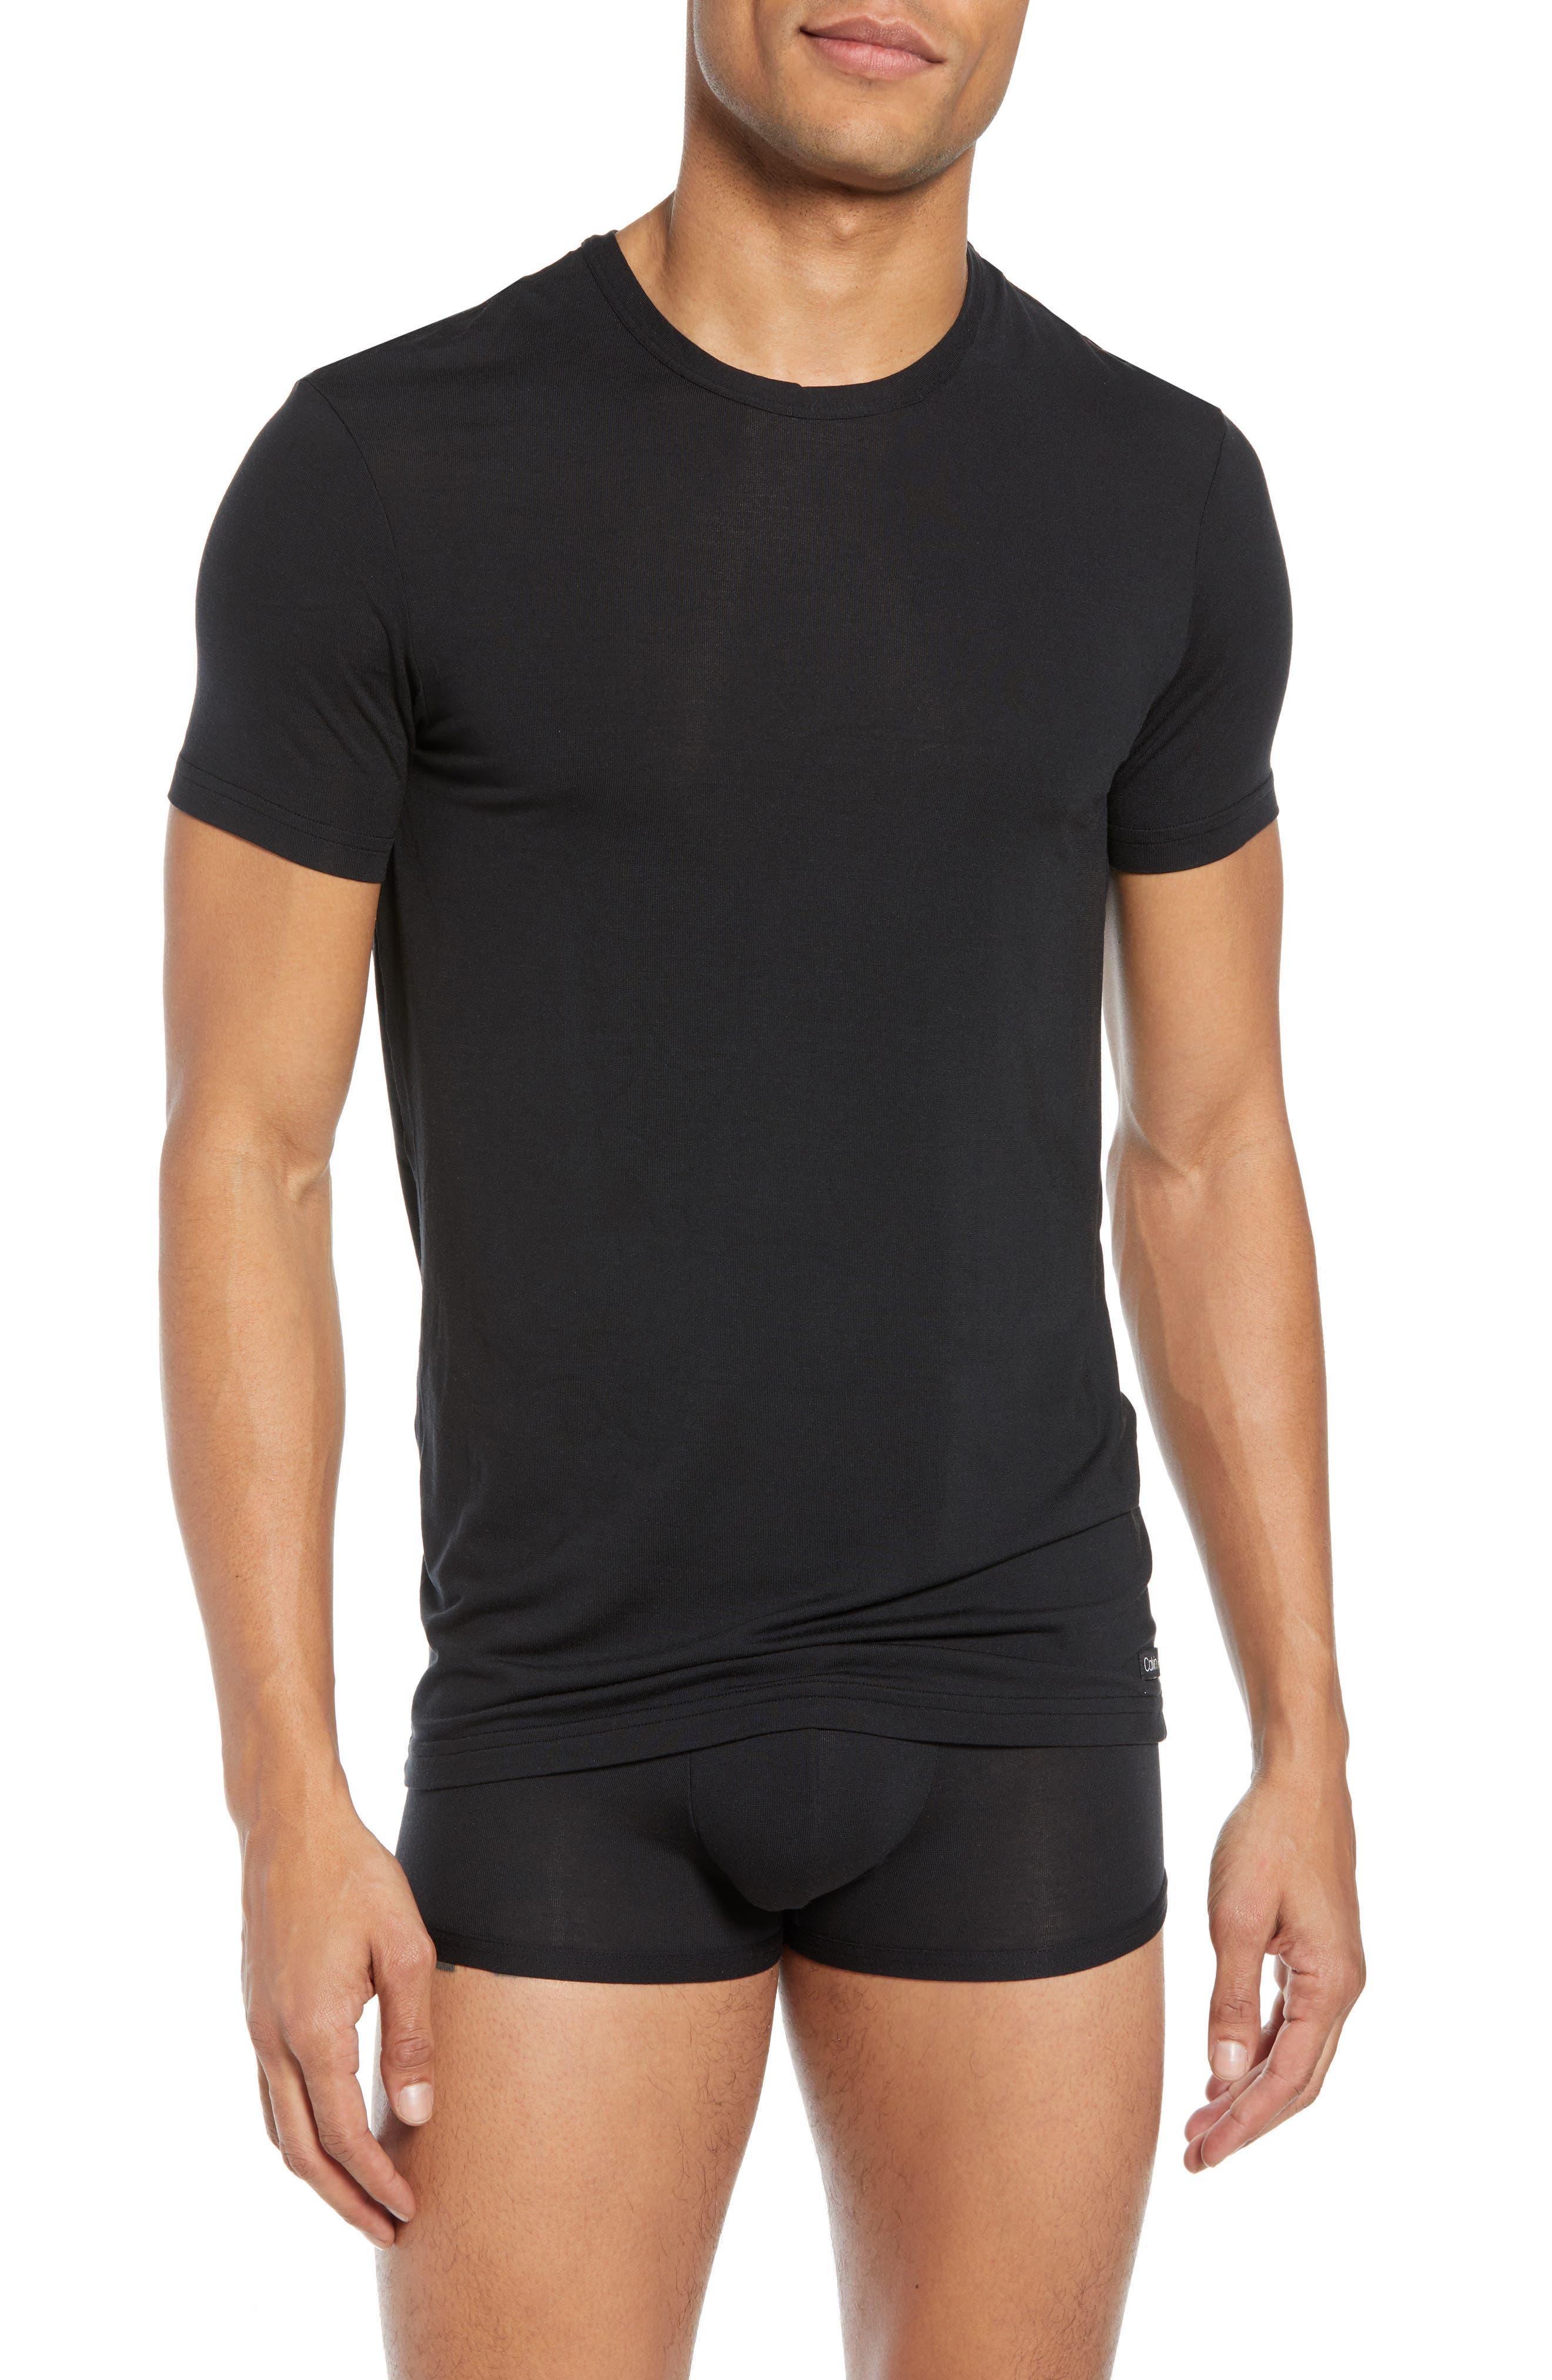 CALVIN KLEIN Ultrasoft Stretch Modal Blend Crewneck T-Shirt, Main, color, BLACK